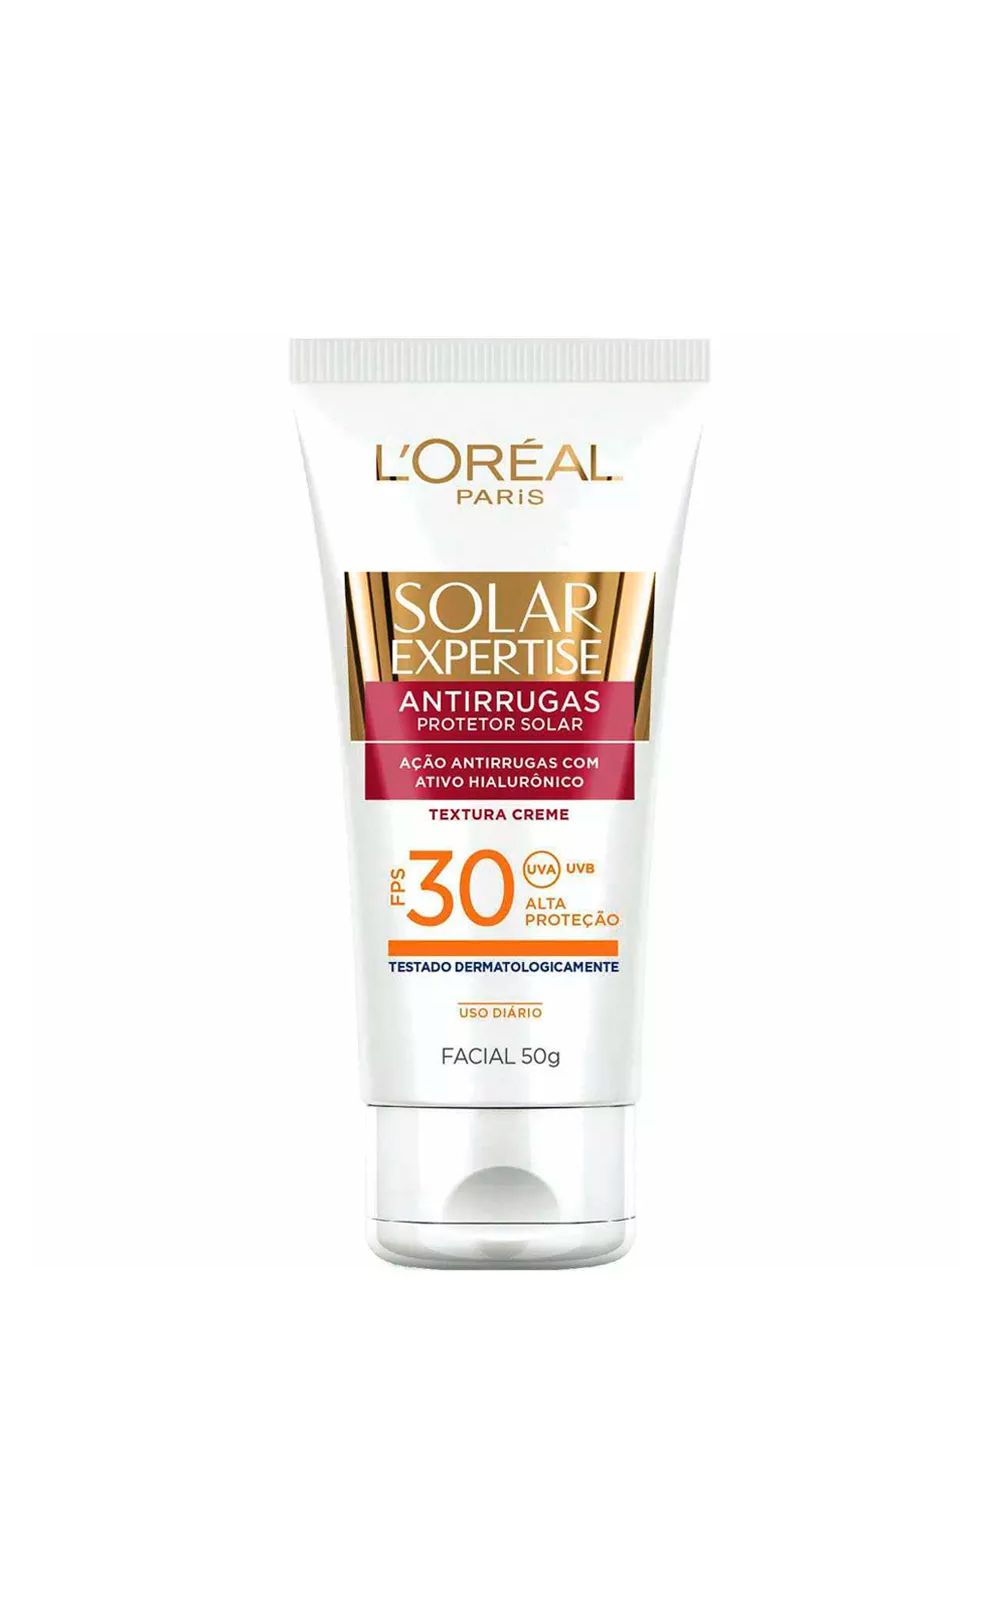 Foto 3 - L'Oréal Paris Kit - Água Micelar 5 em 1 + Solar Expertise Antirrugas FPS30 - nenhuma